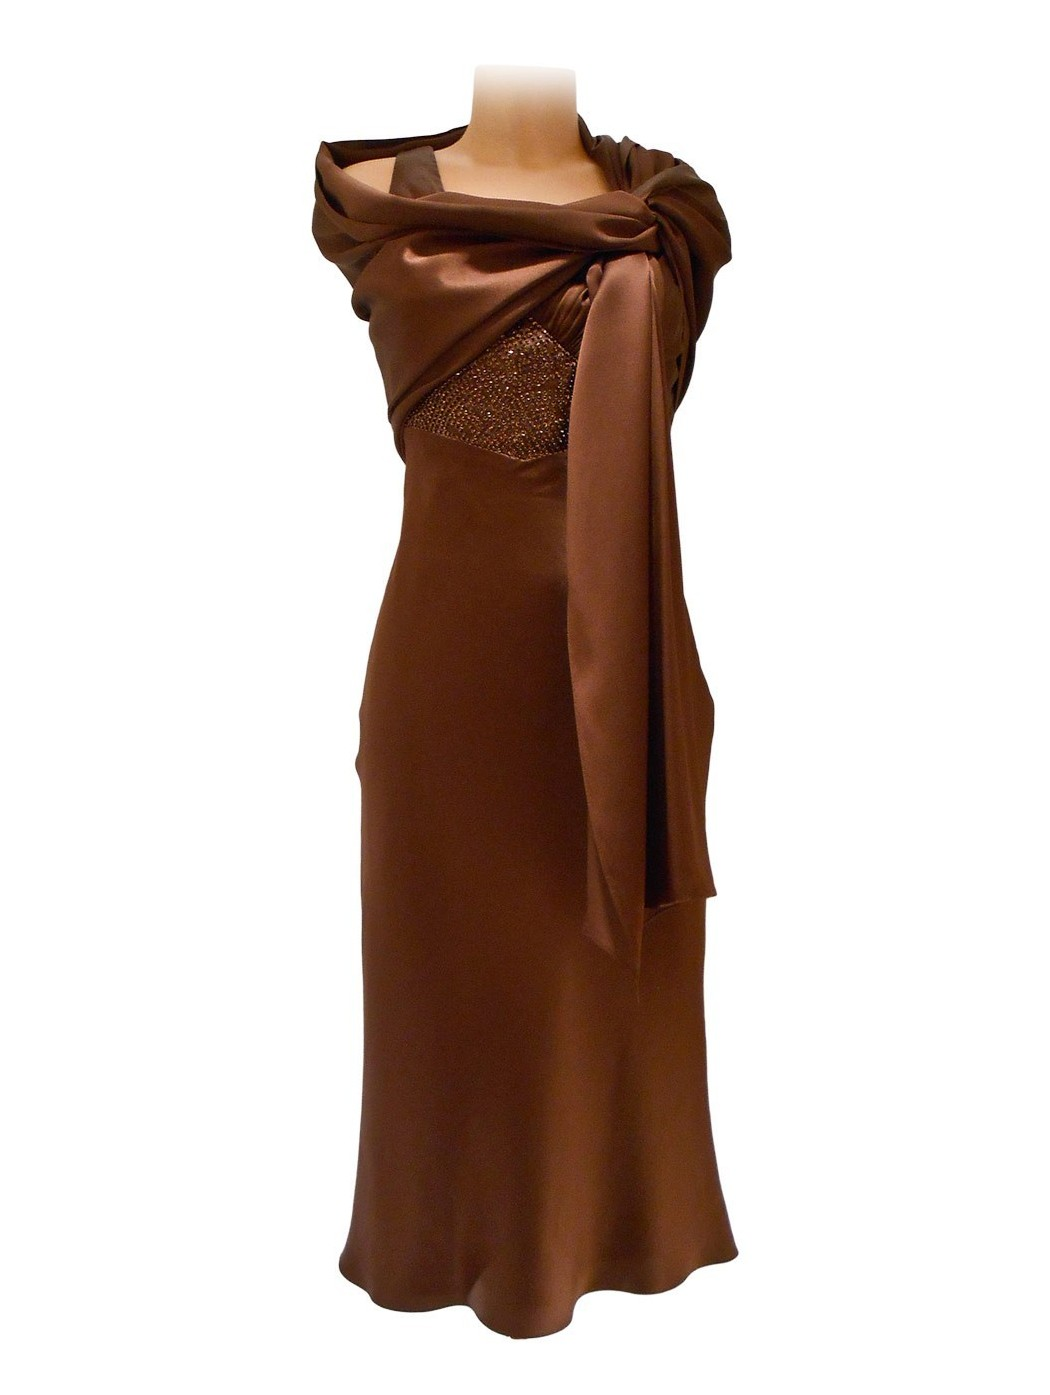 Атласное платье лука Джордани